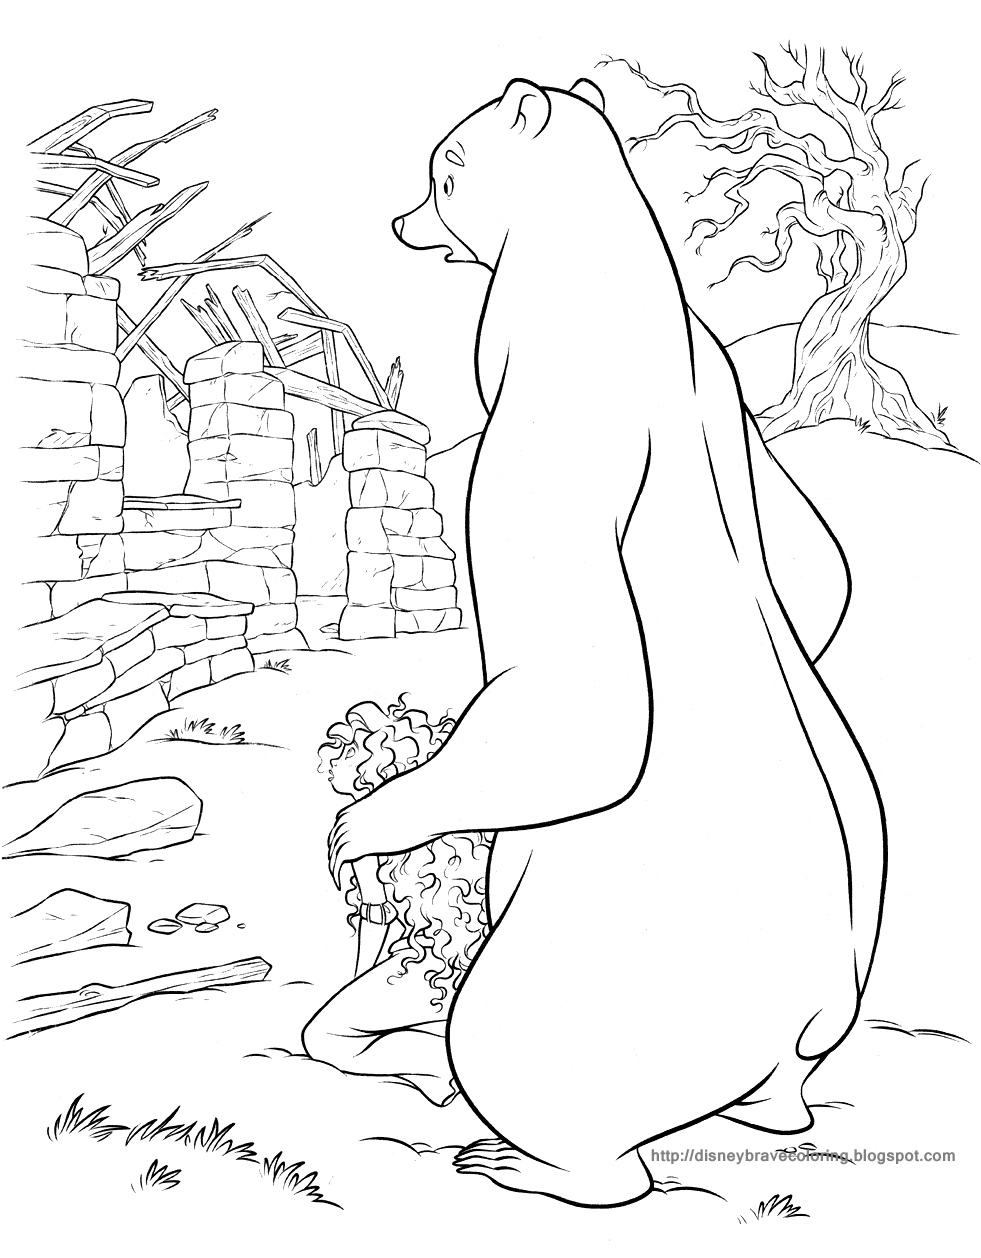 disney brave coloring pages - photo #46